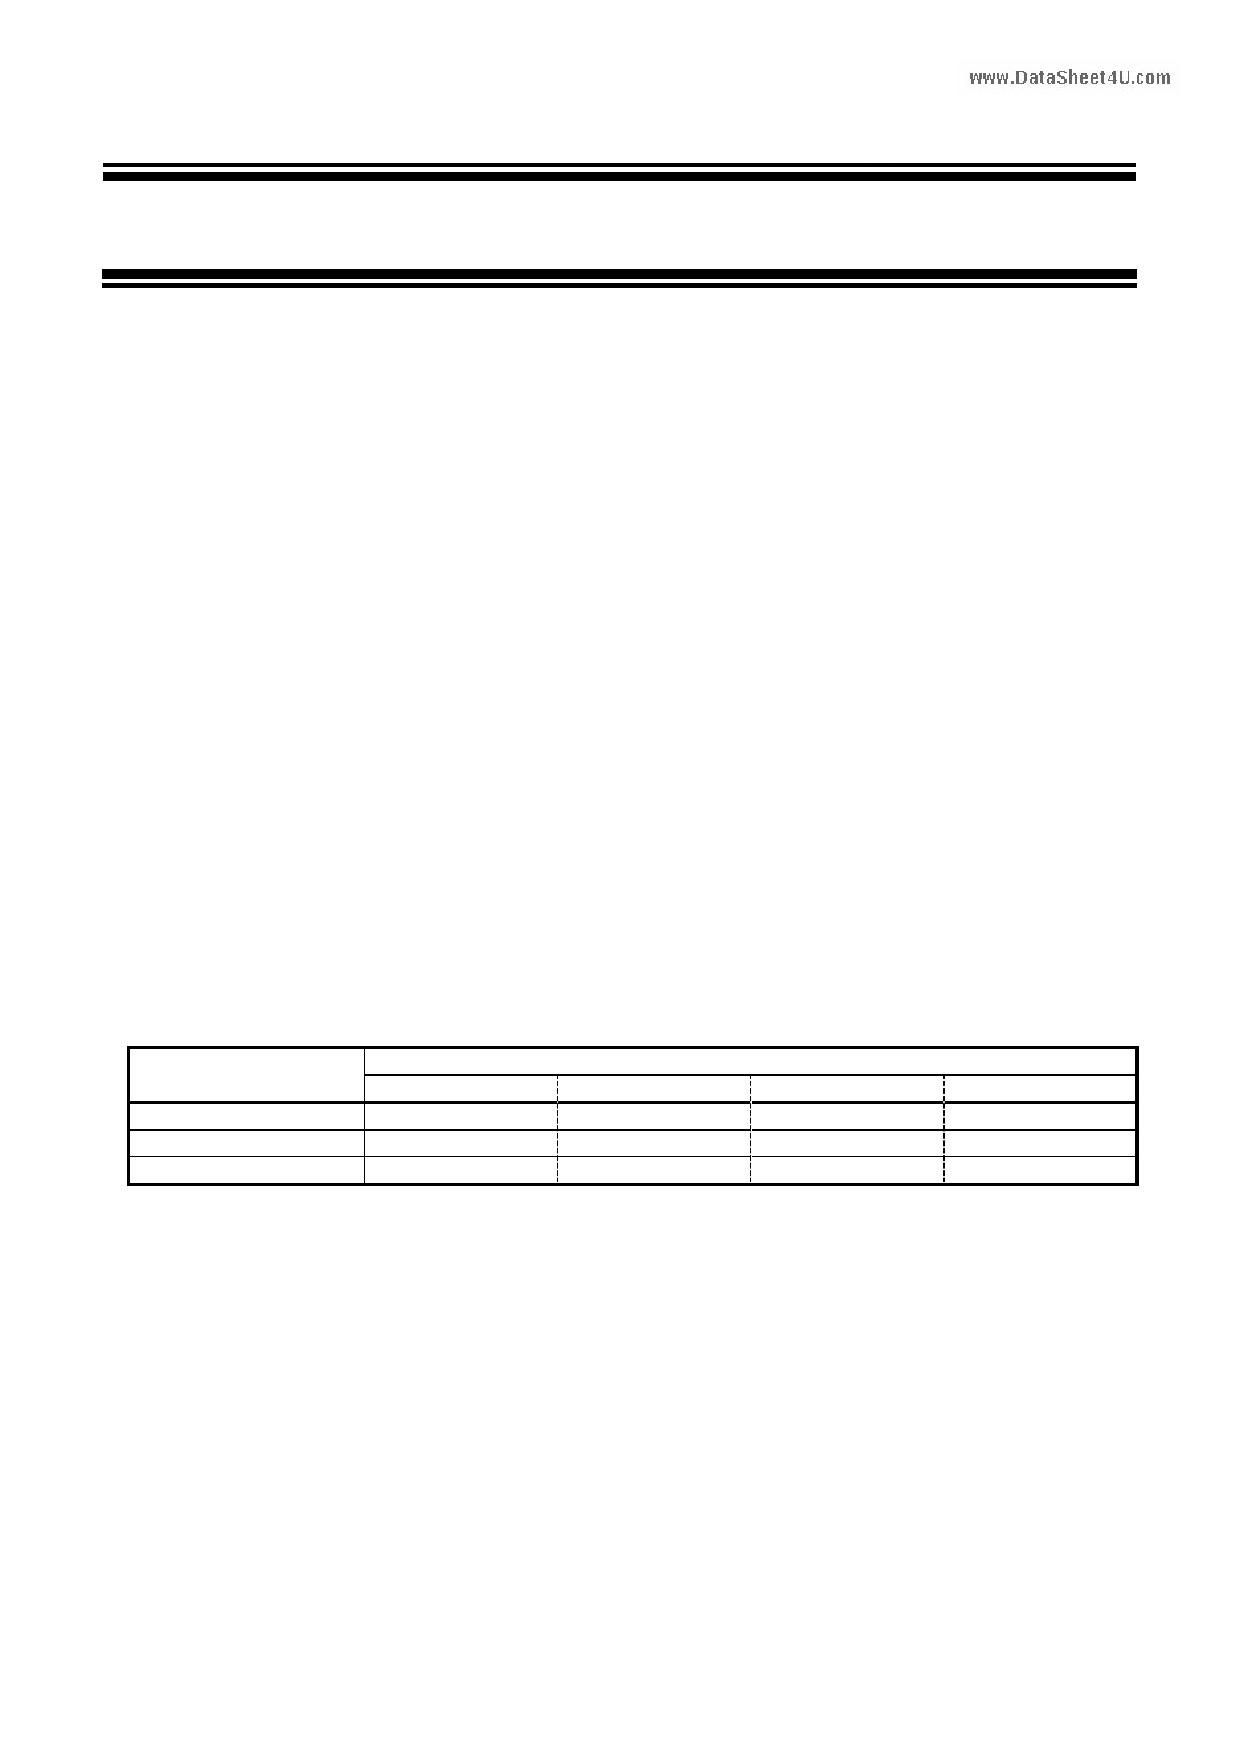 S-809xxC datasheet